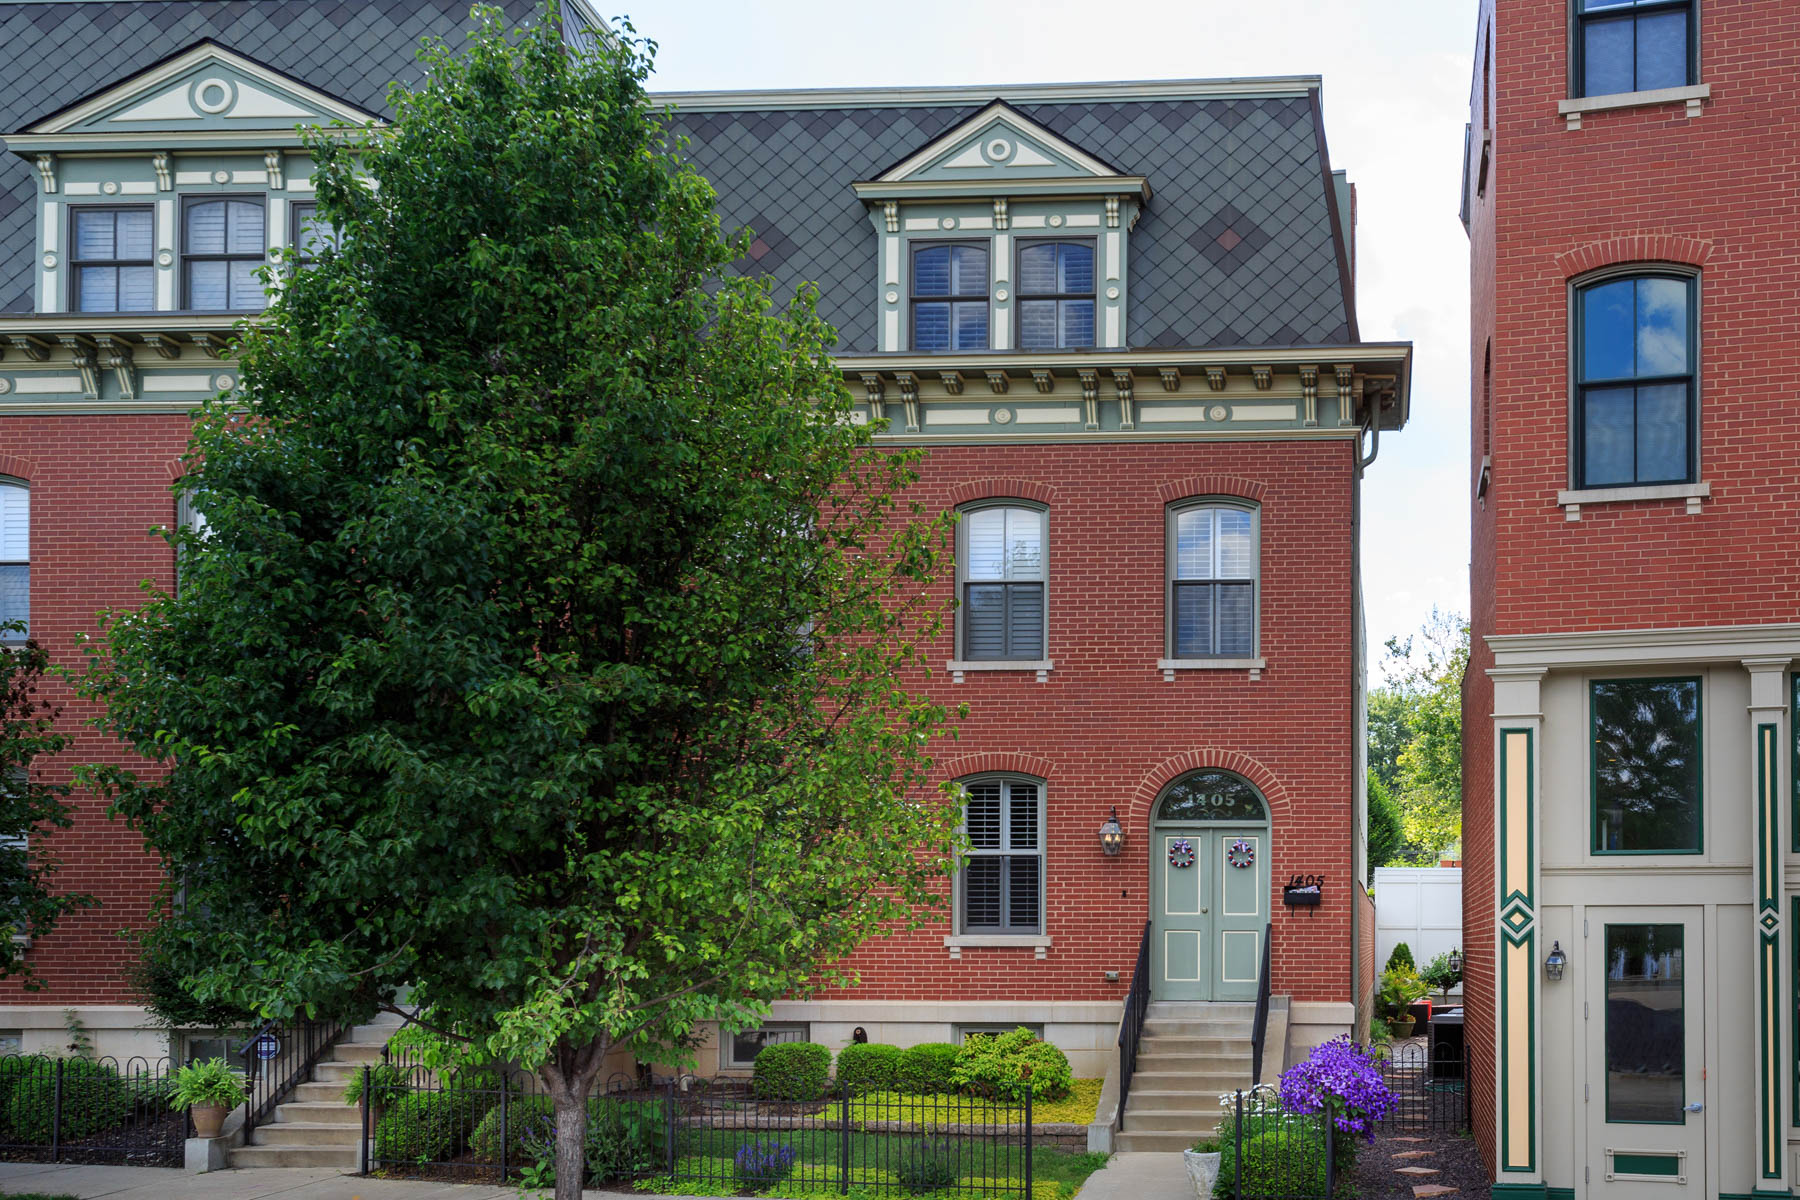 Tek Ailelik Ev için Satış at Vail Place/Lafayette Square 1405 Vail Place St. Louis, Missouri 63104 Amerika Birleşik Devletleri